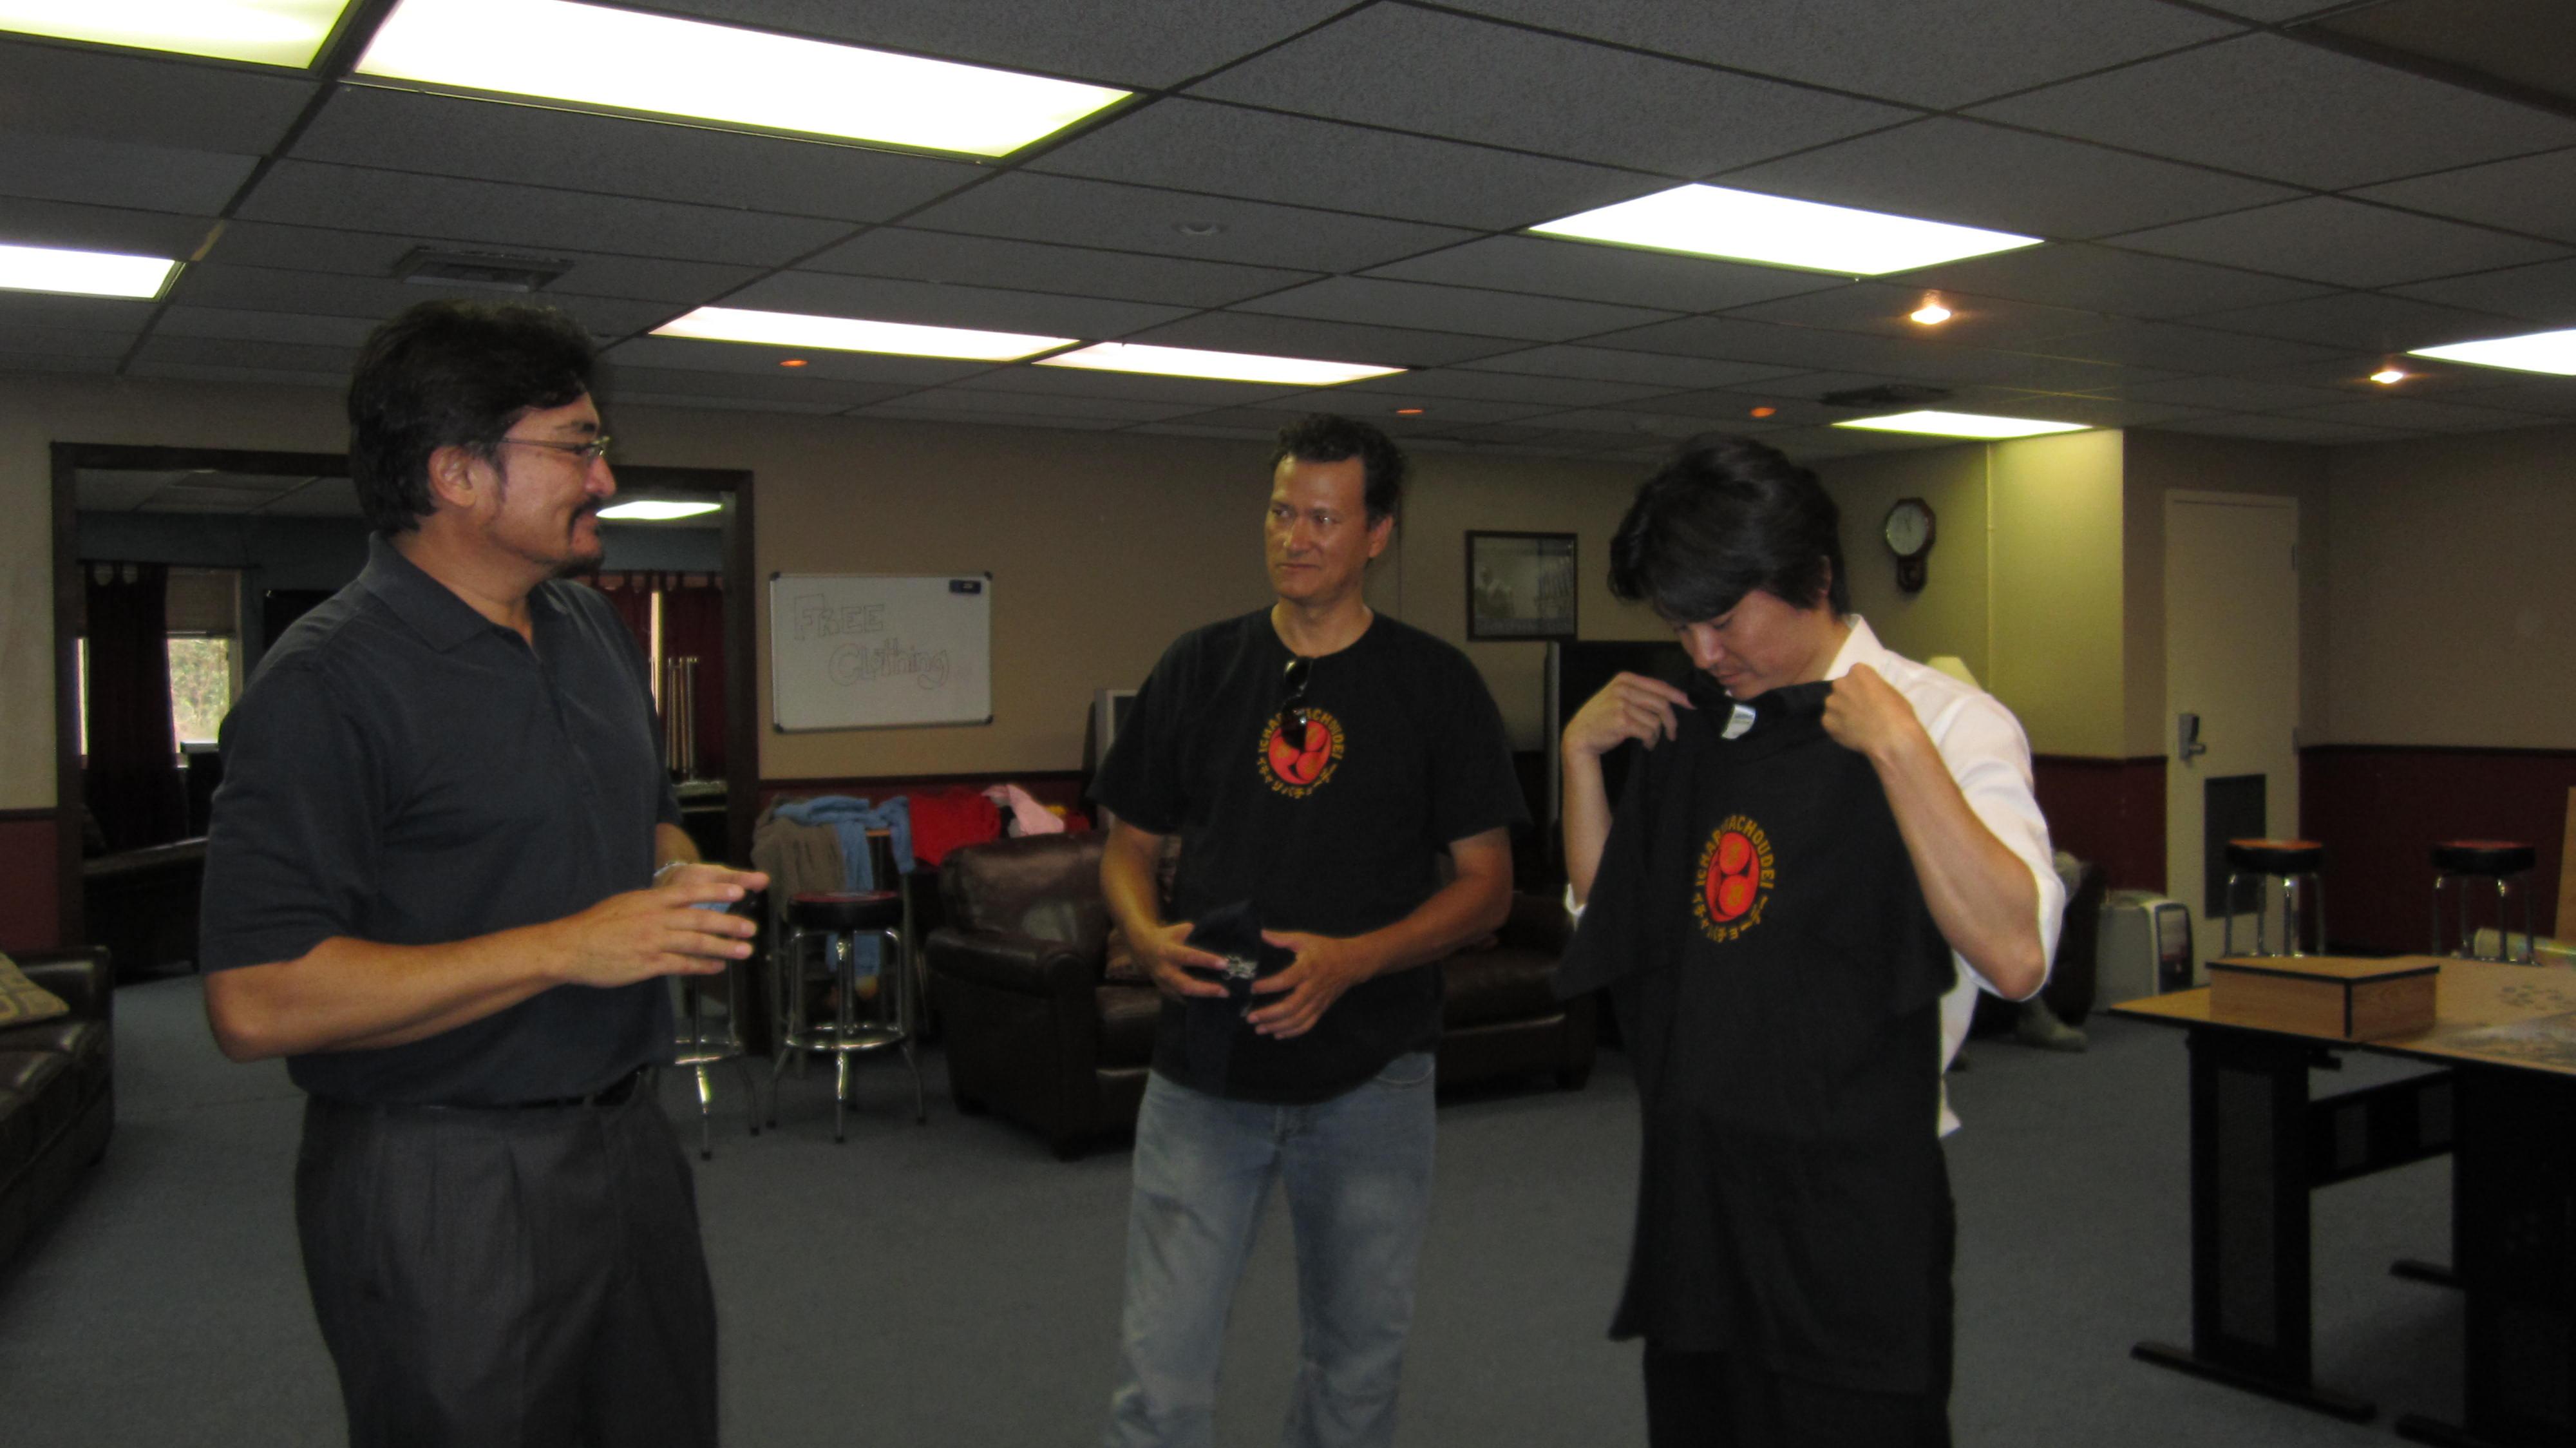 2012-09-19 A Lunch with Mr. Shin Koyamada and U.S. Airmen.